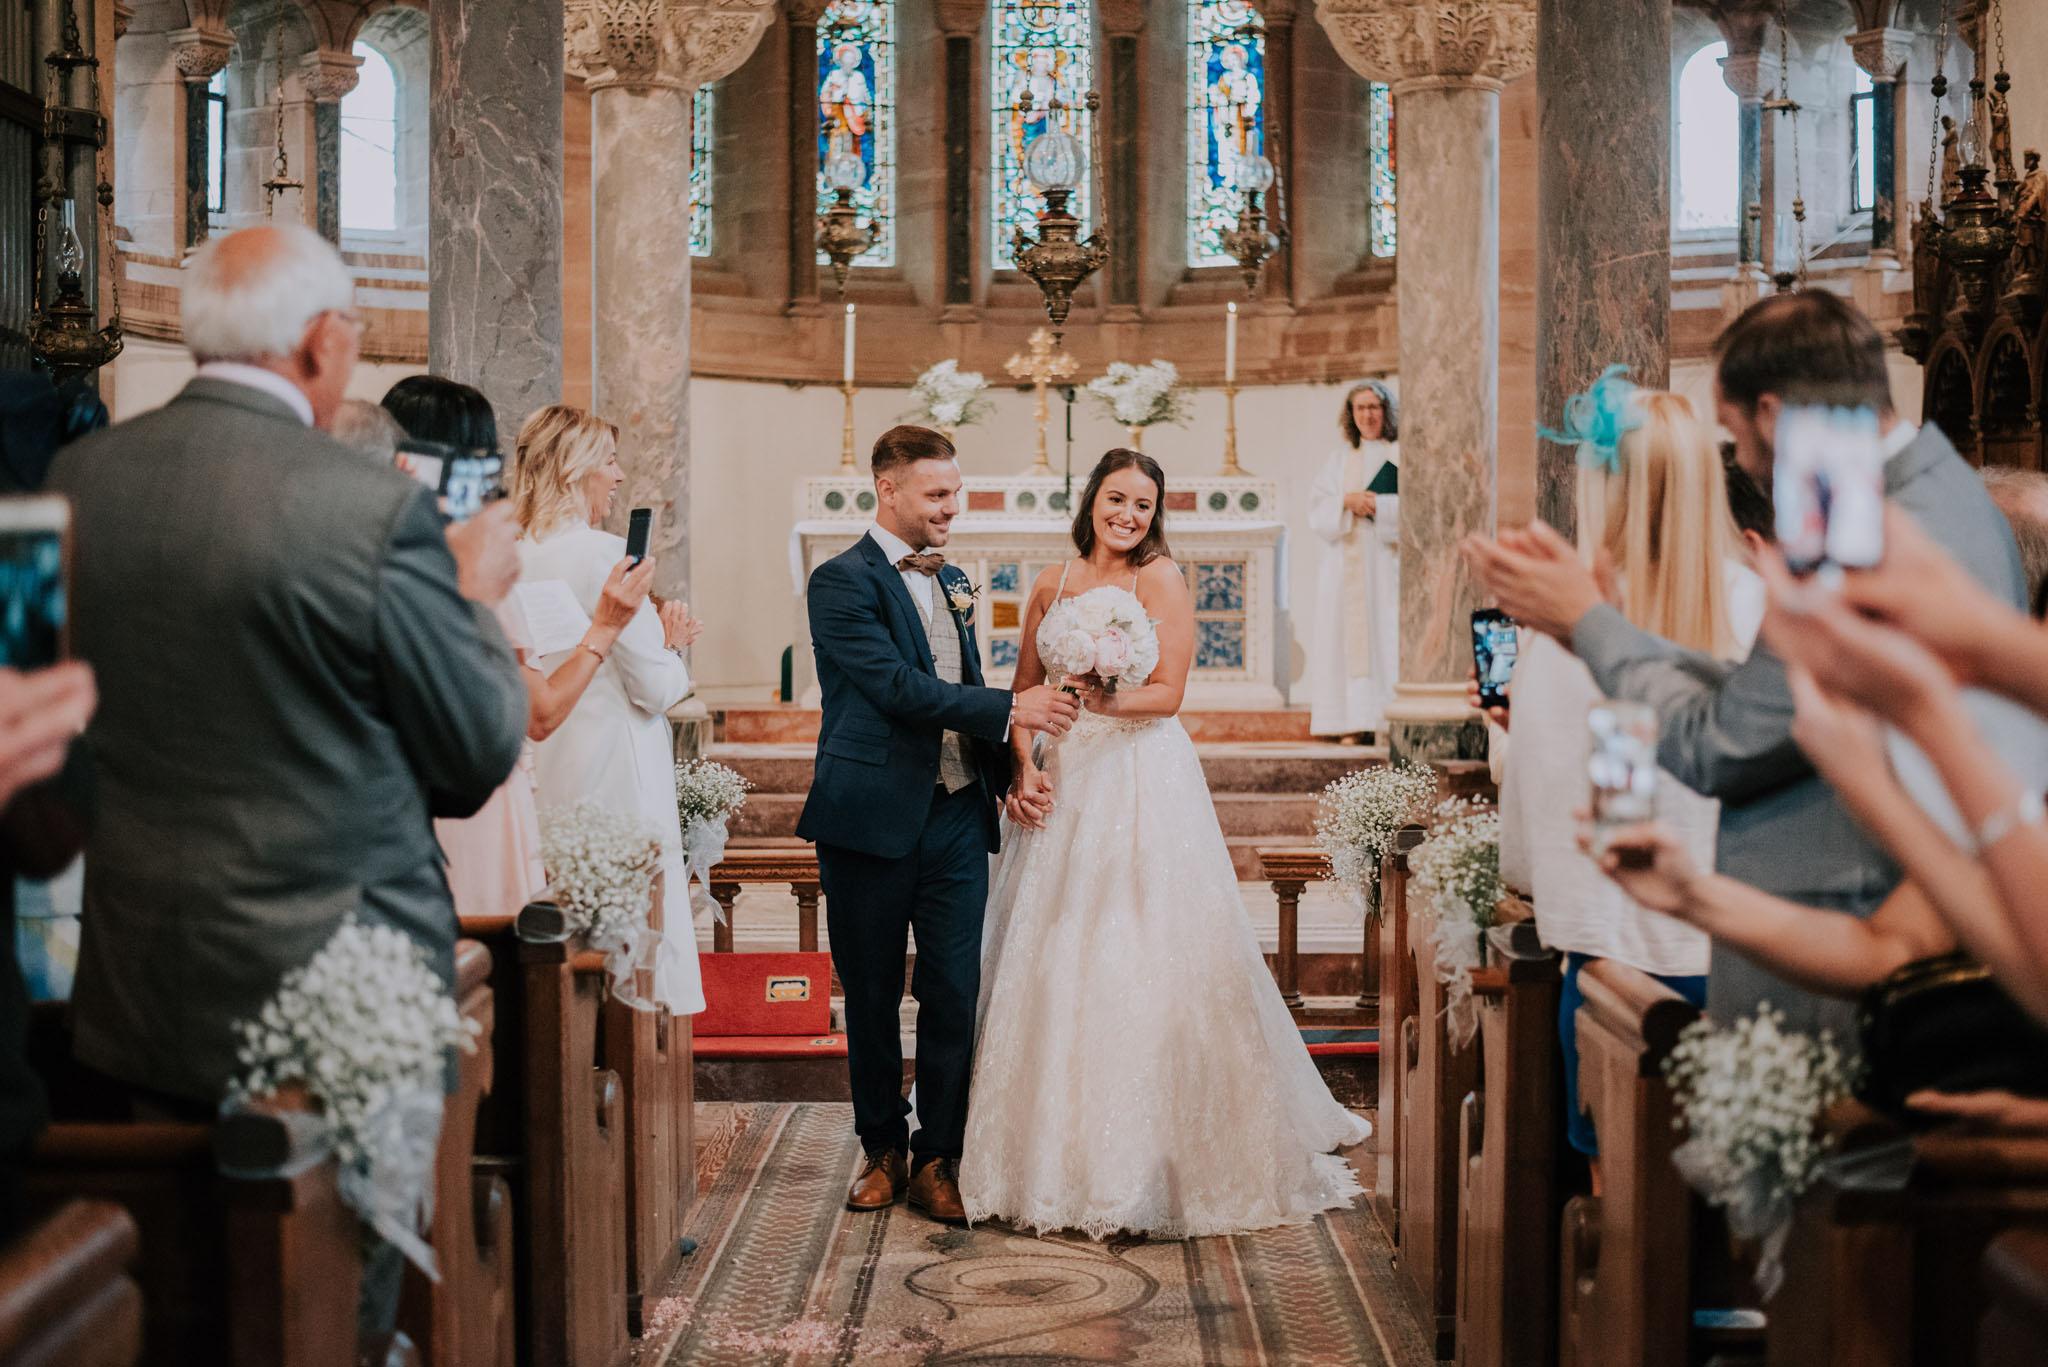 wedding-photographer-glewstone-court-hereford-scott-stockwell-photography225.jpg